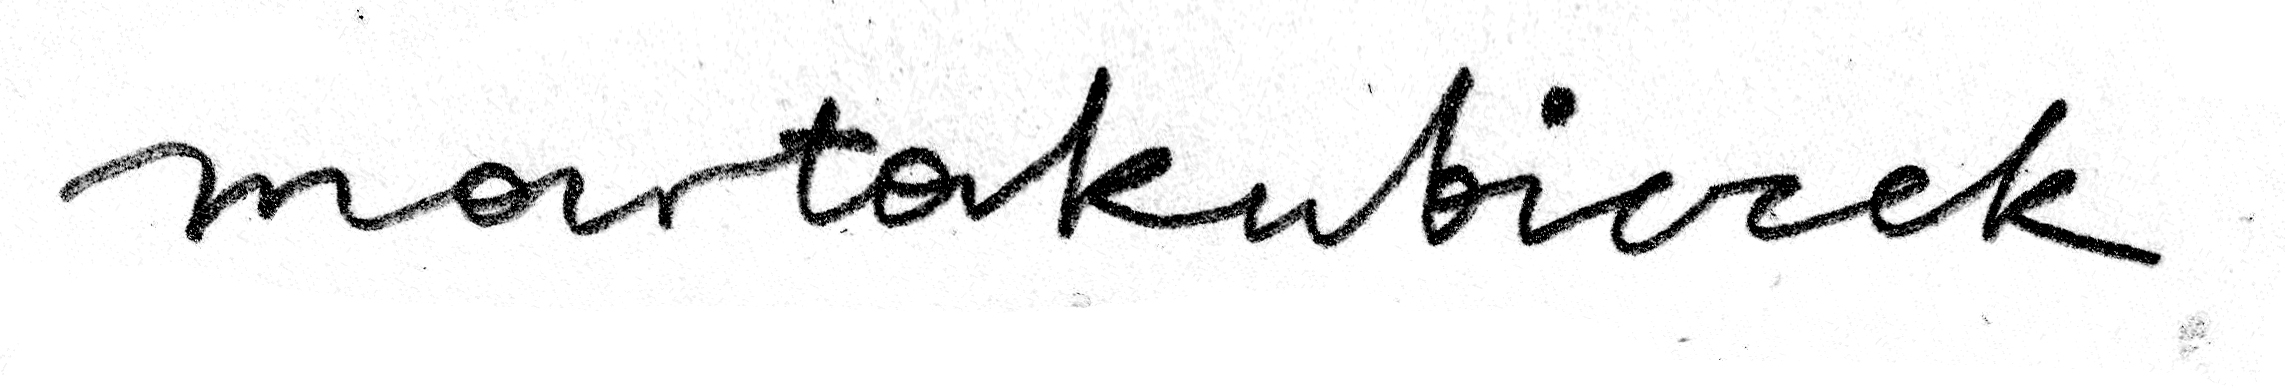 Marta Kubiczek's Signature